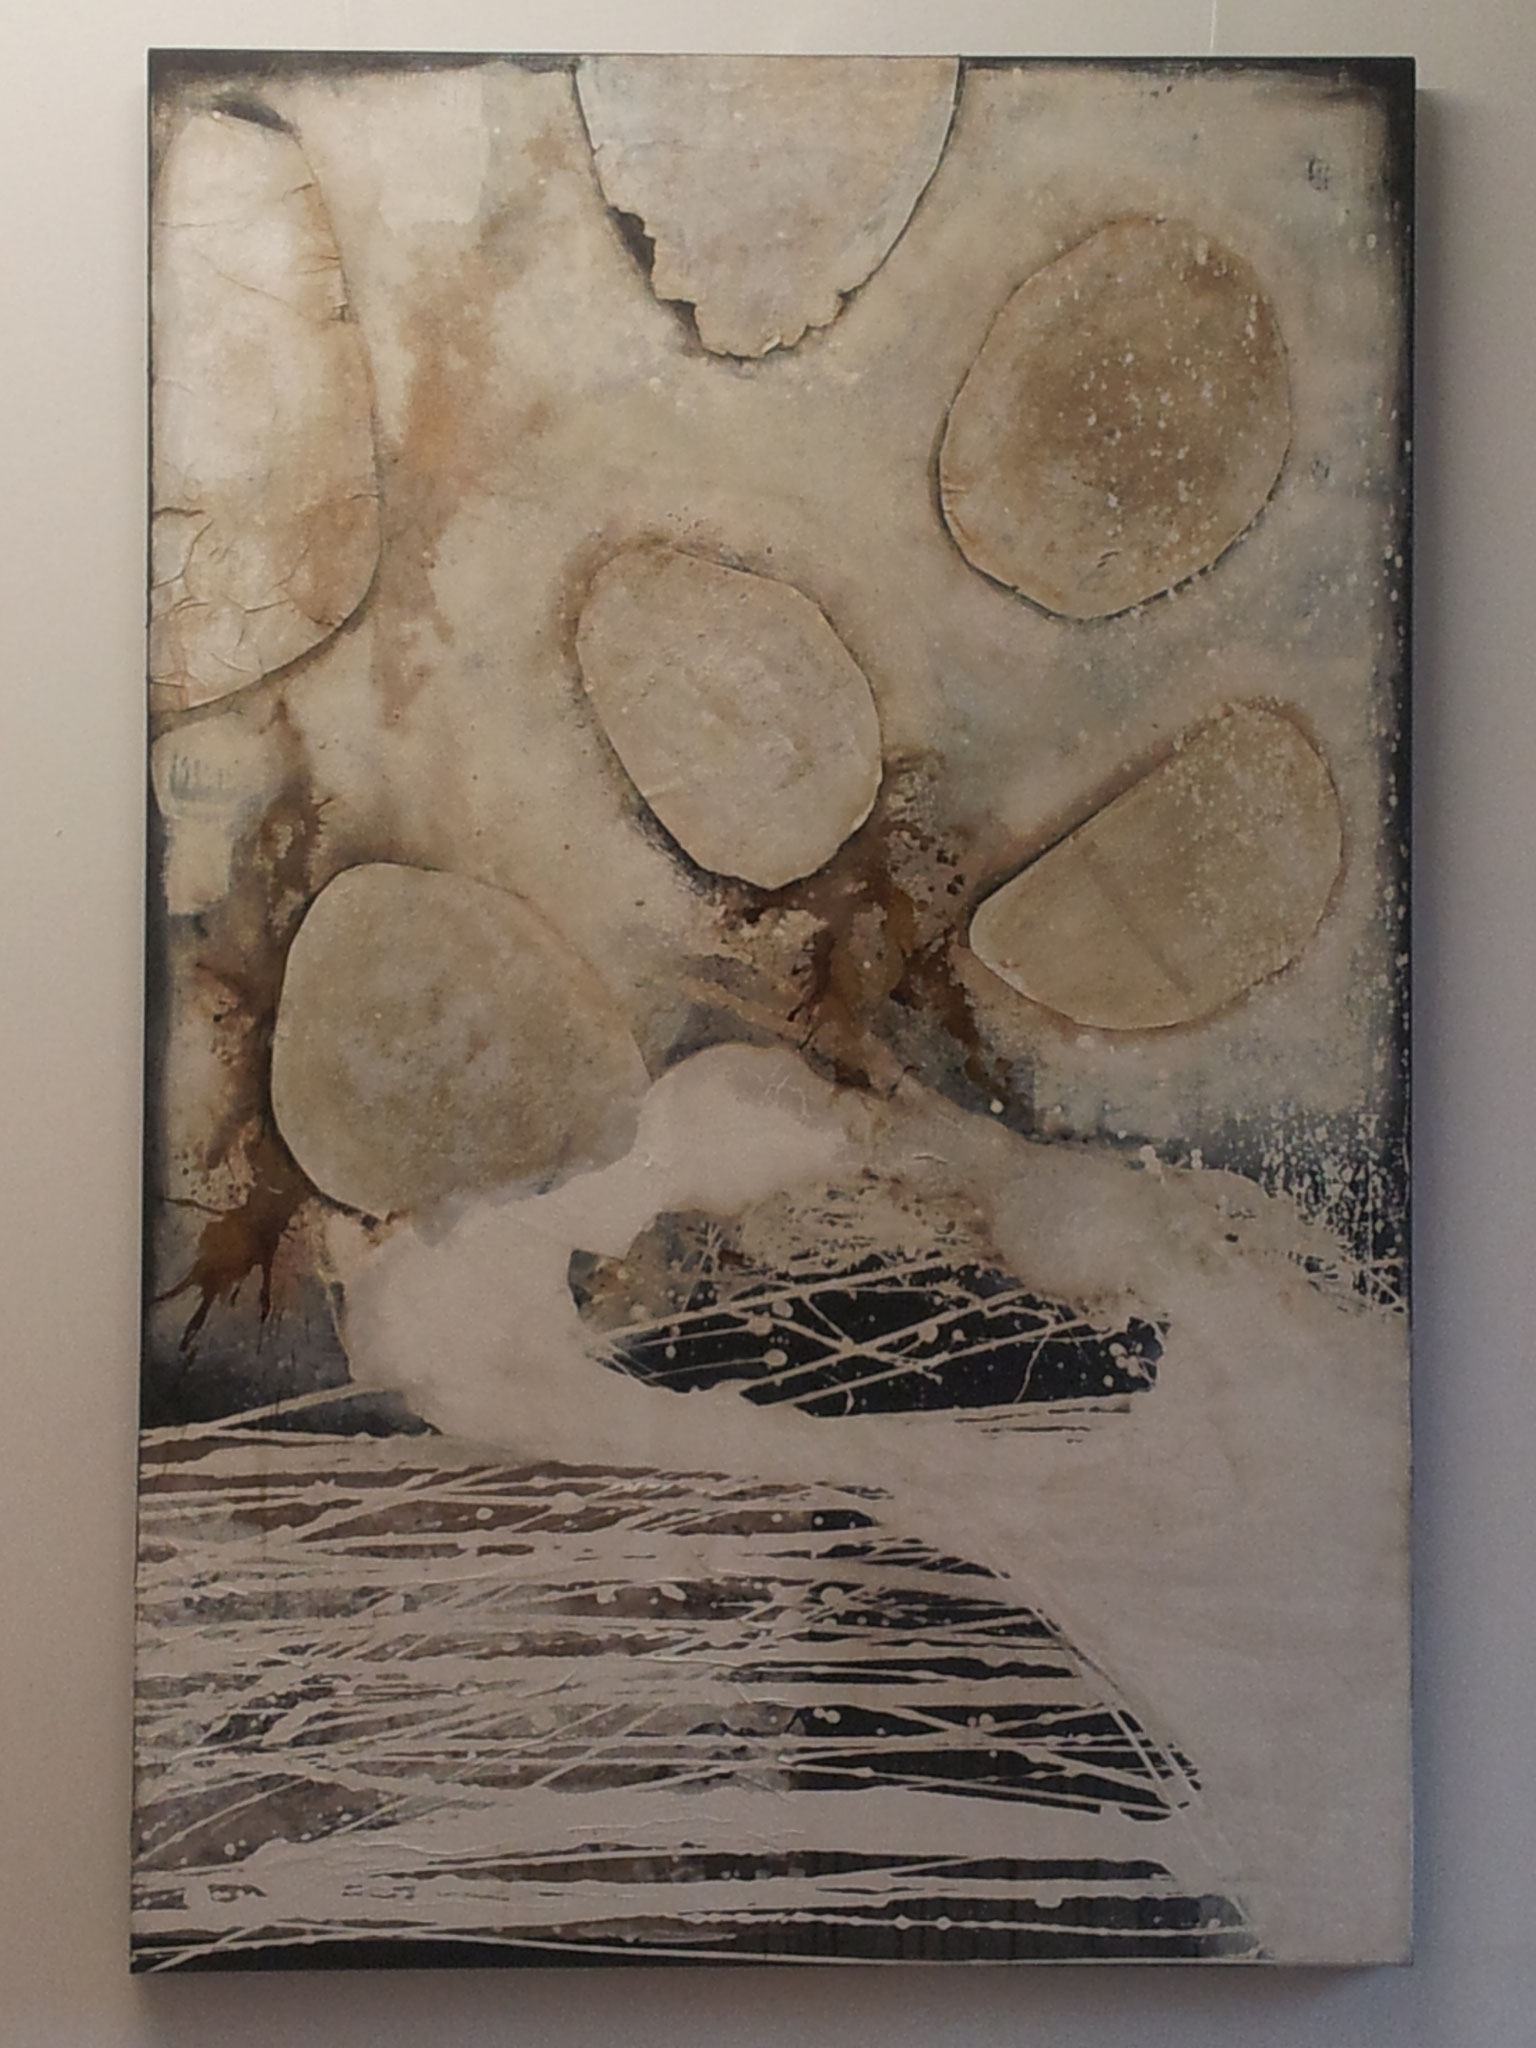 Xxl Art xxl art special - atelier sonja lambert